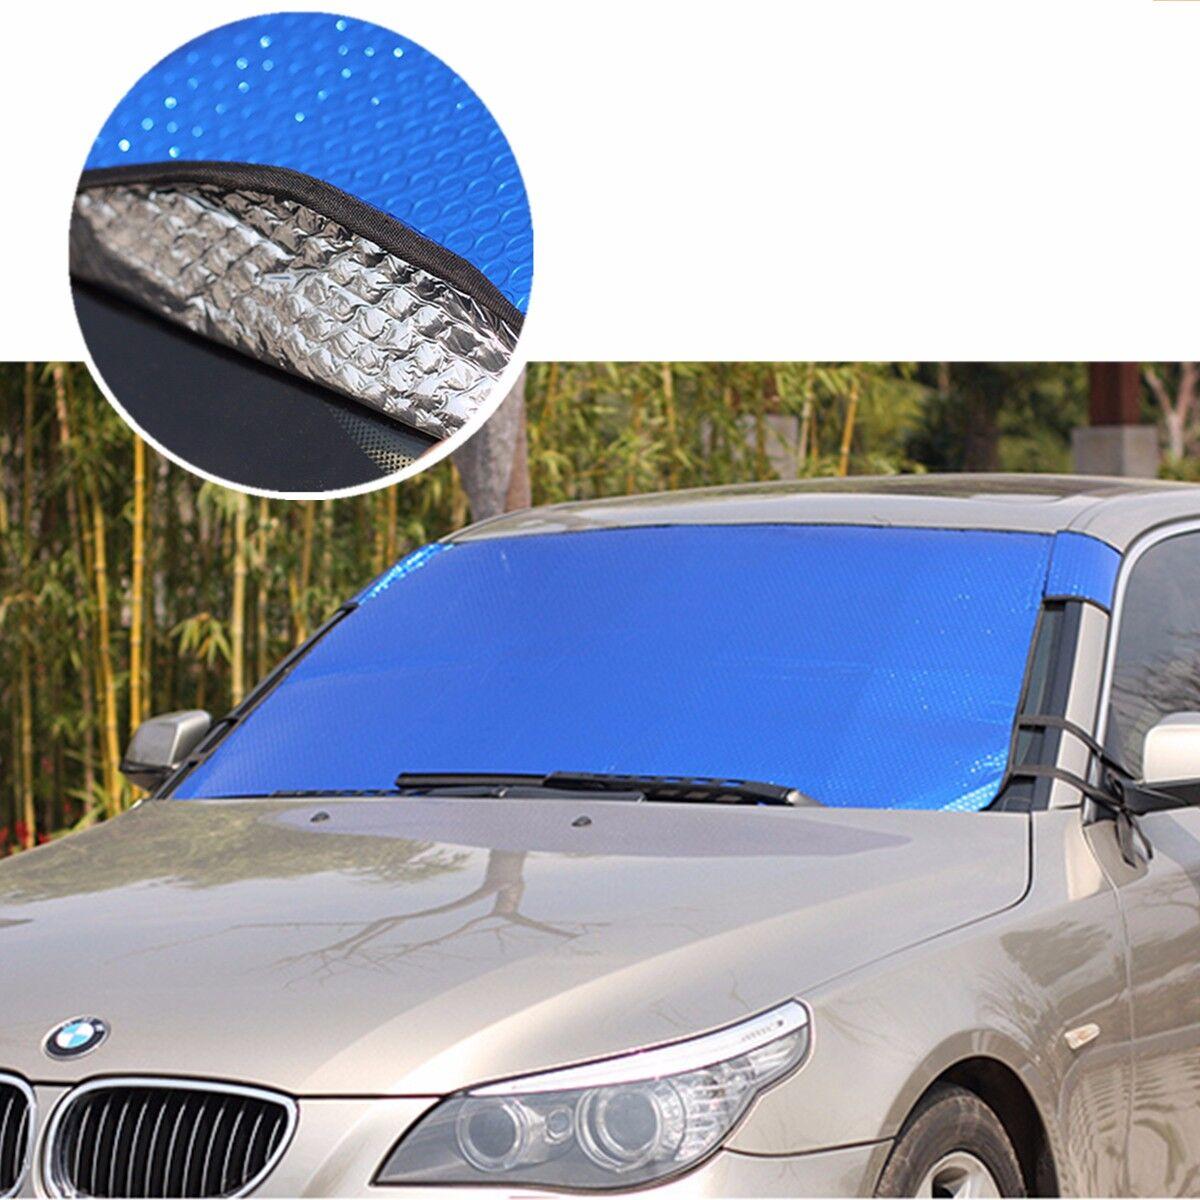 Newchic Car Window Foils Sun Protection Anti-heat Cover Windshield Car Windshield Sun Cover